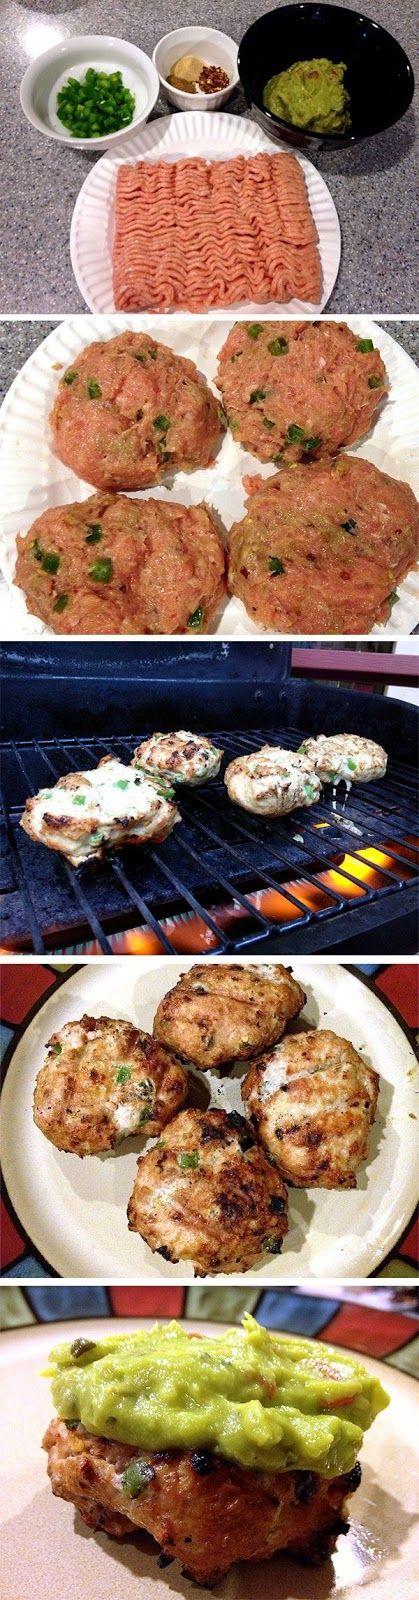 How To Spicy Guacamole Chicken Burgers